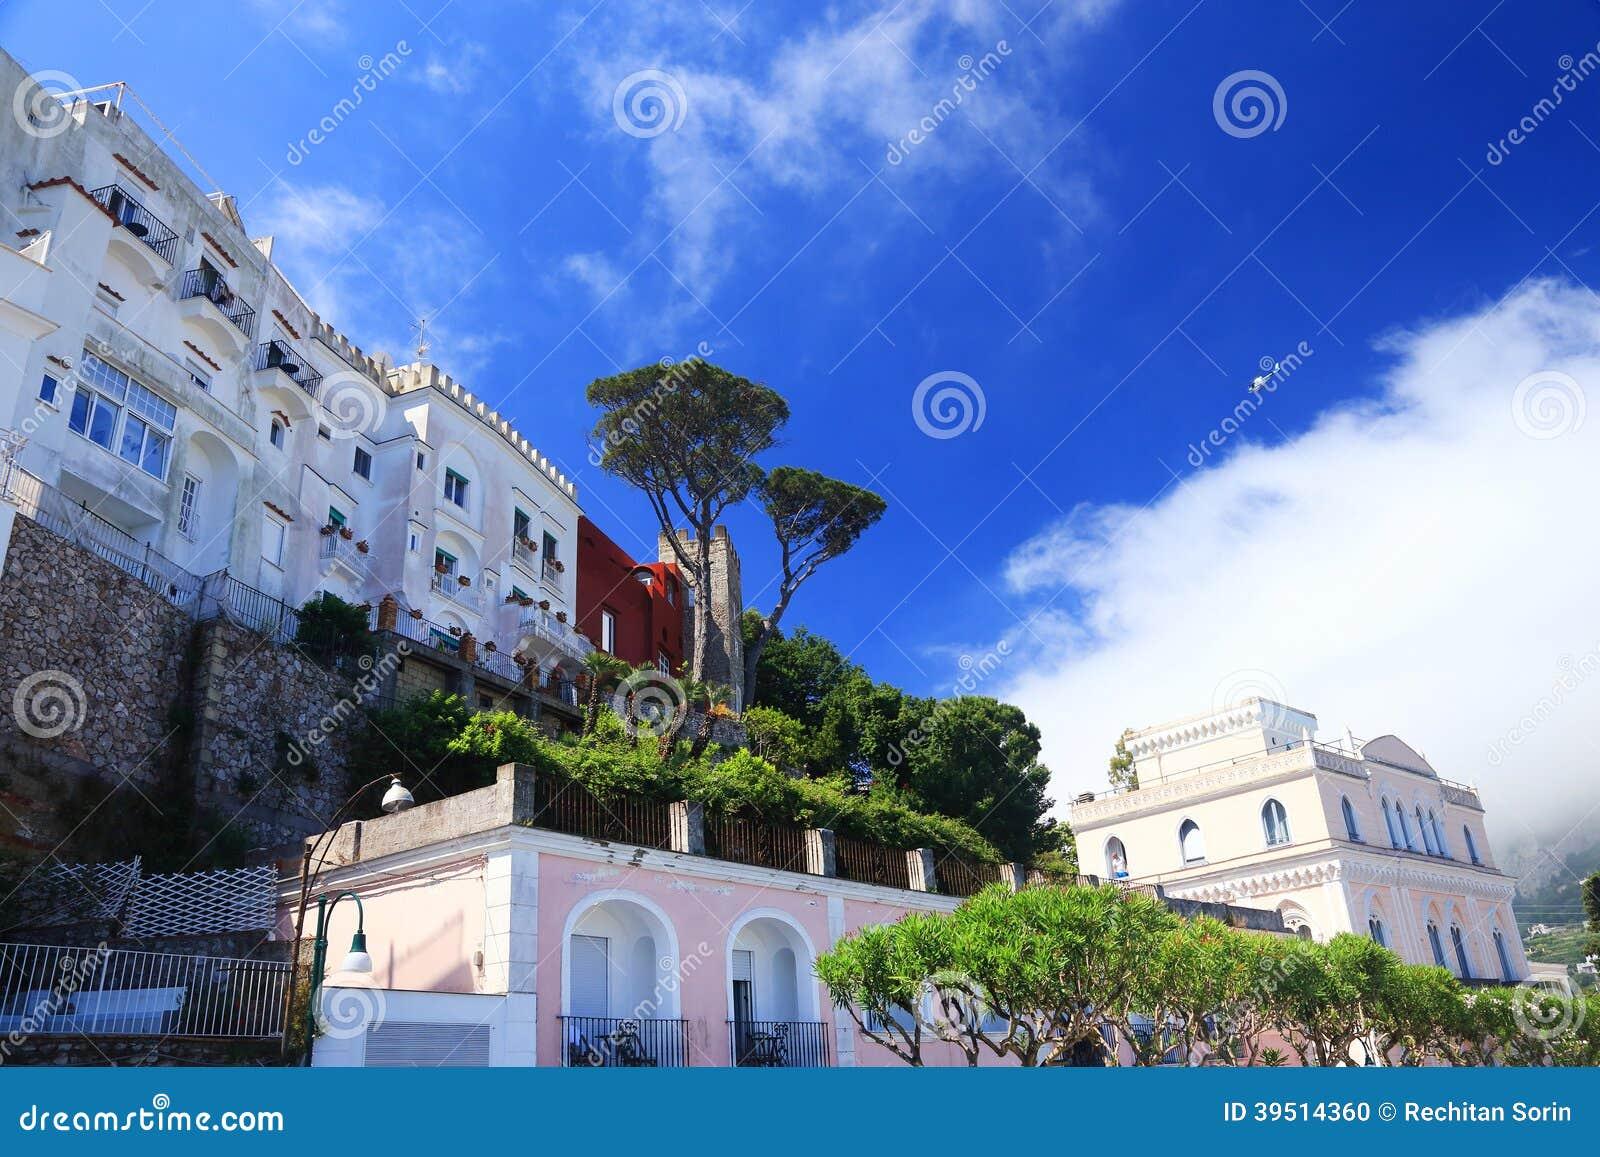 Capri Island, Italy, Europe